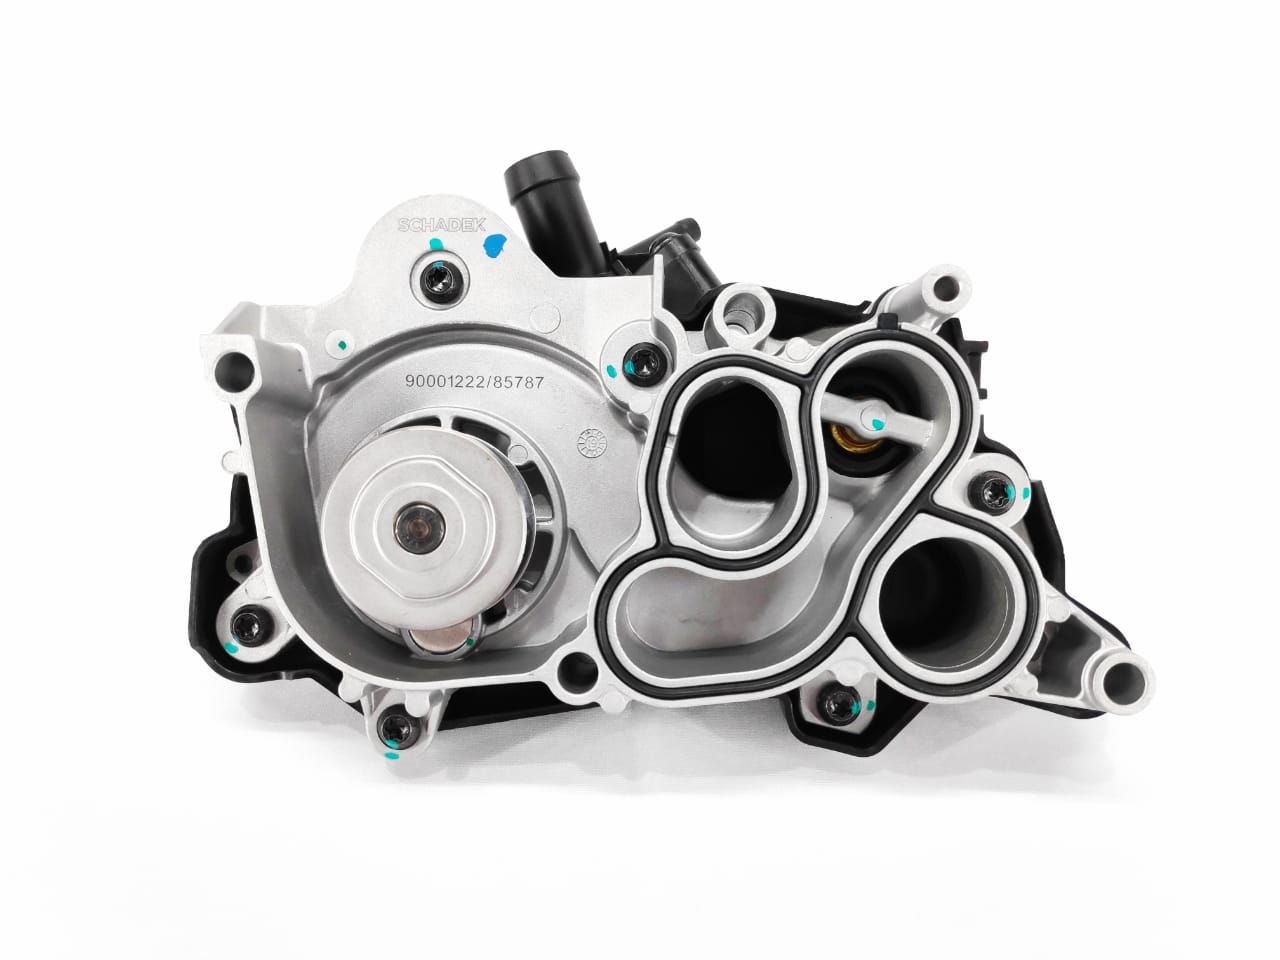 Bomba d Agua VW Fox Gol Saveiro 1.6 MSI Up 1.0 12V Após 2014  - Unicar